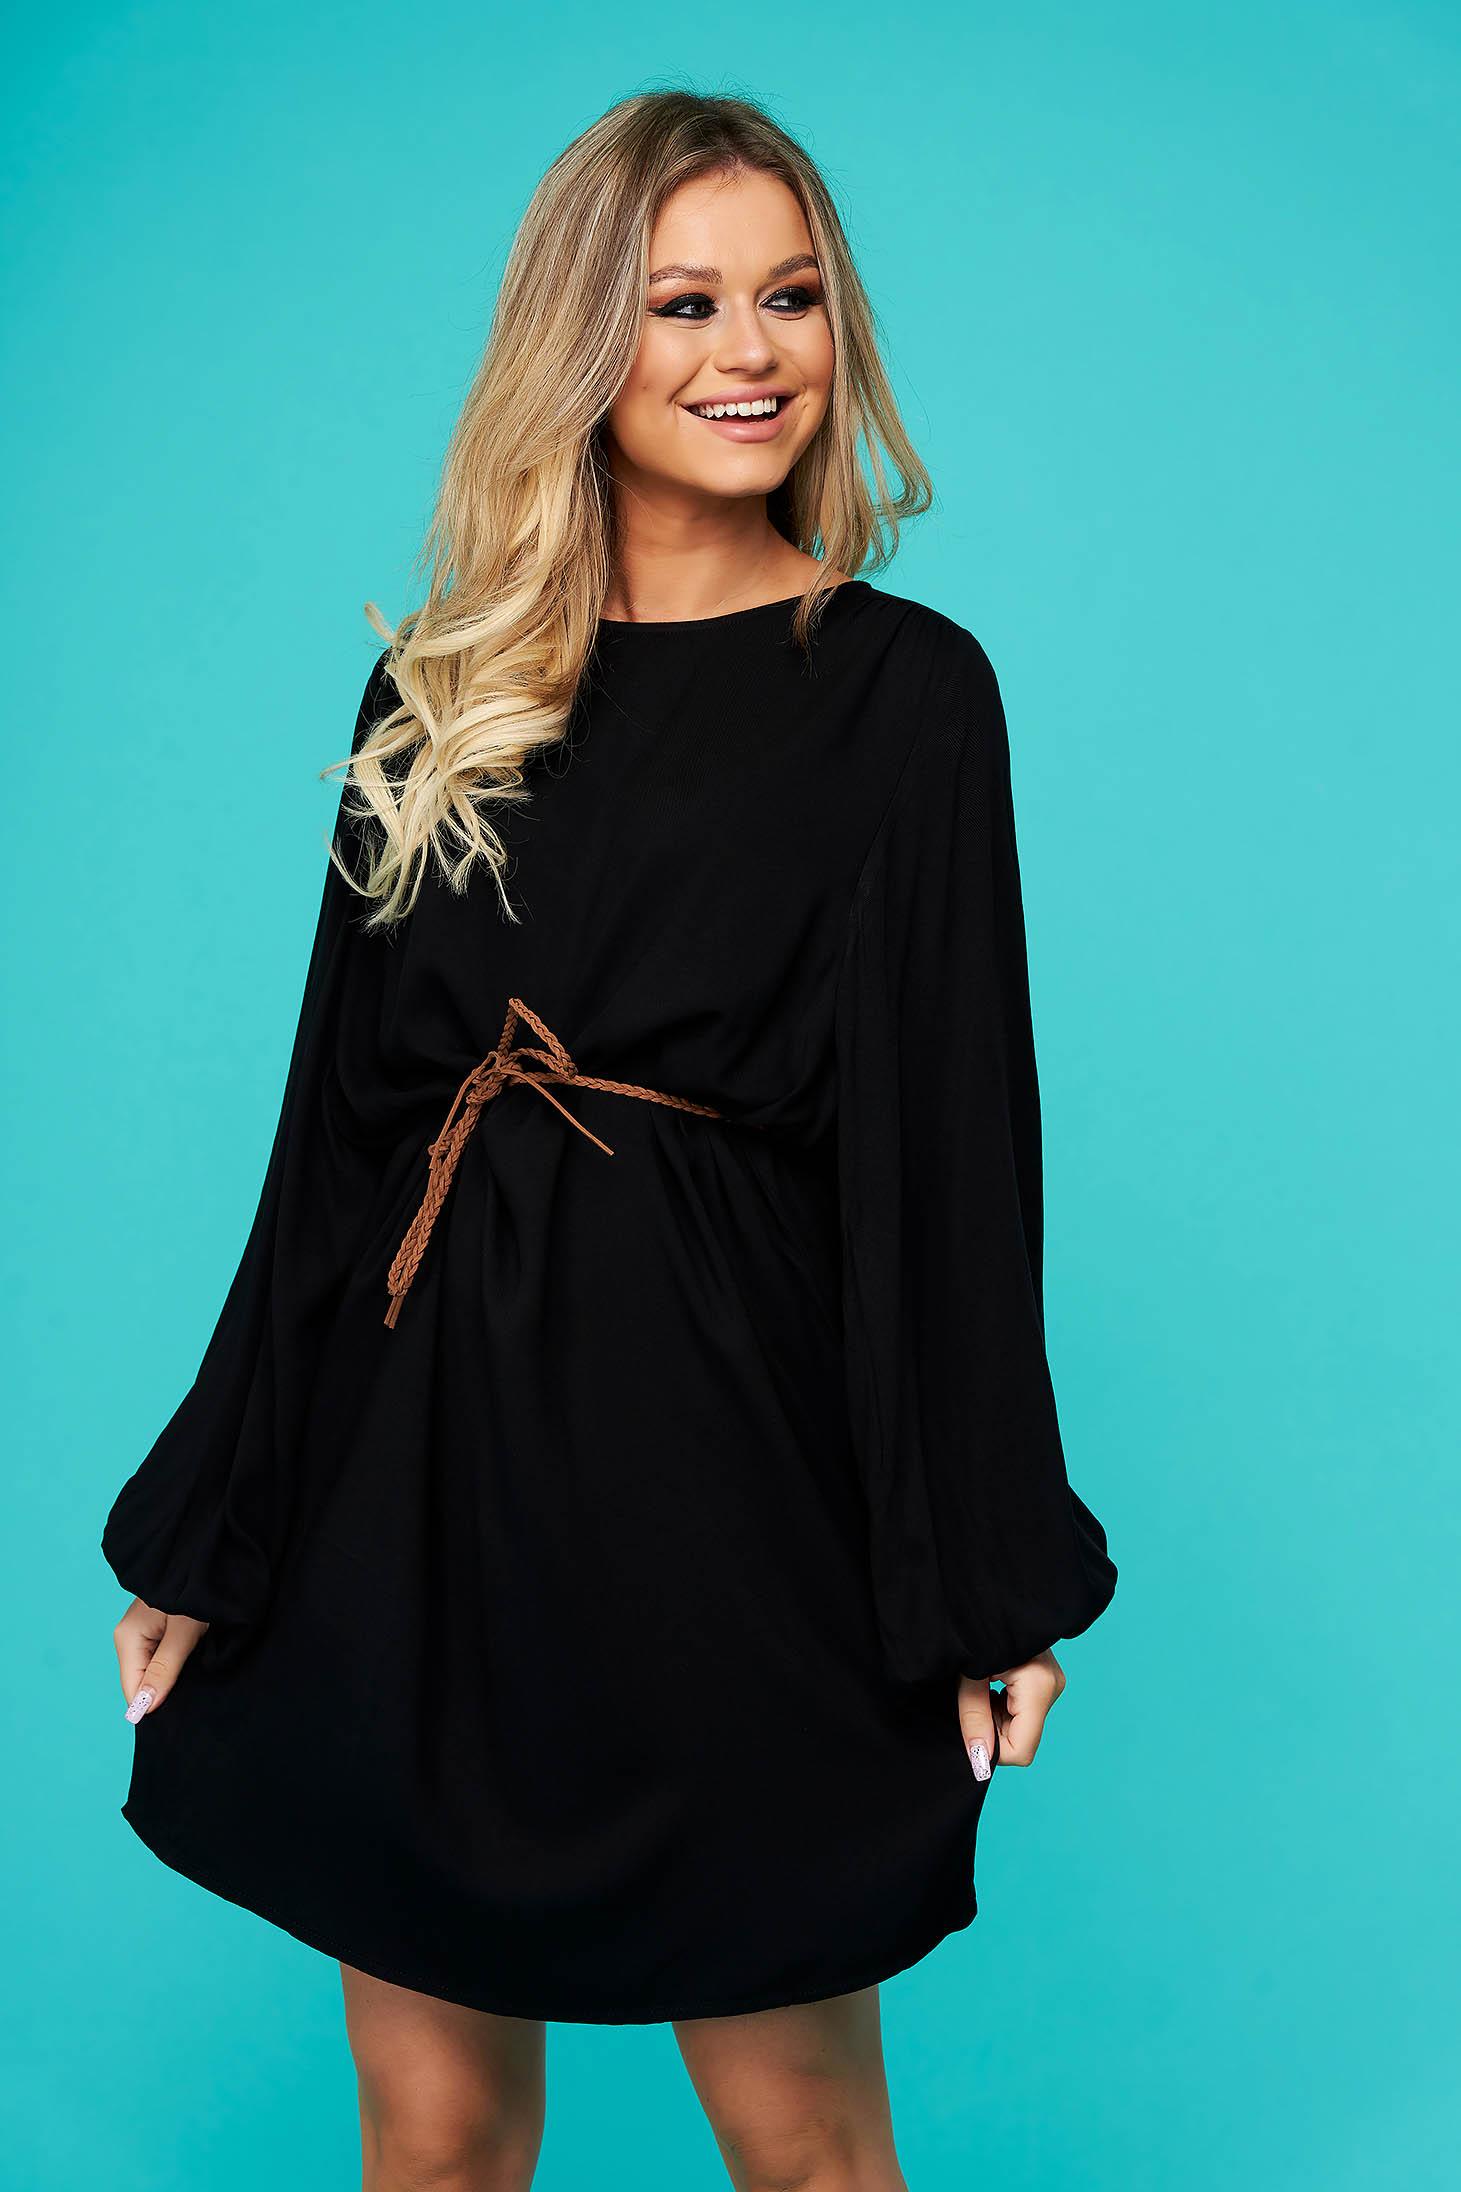 Black dress short cut daily flared long sleeved